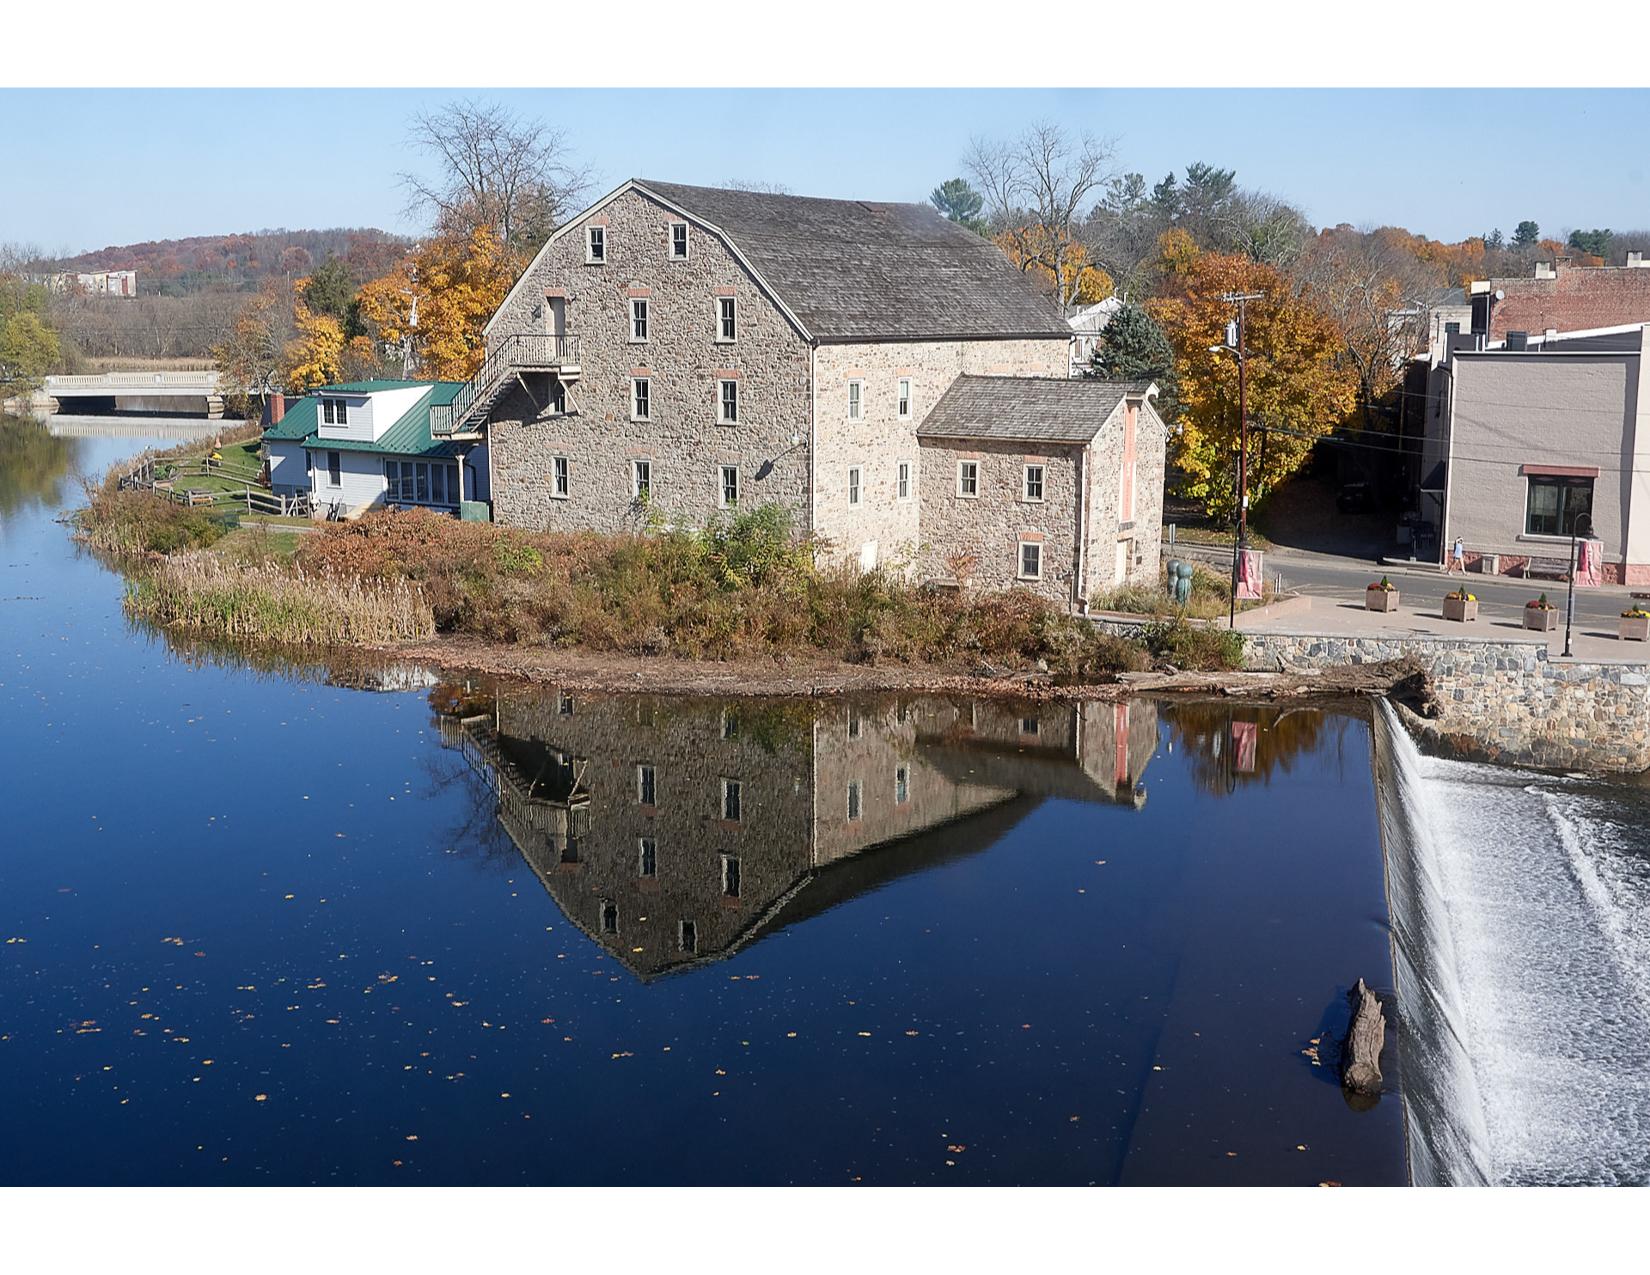 Red Mill Village New Jersey B-17